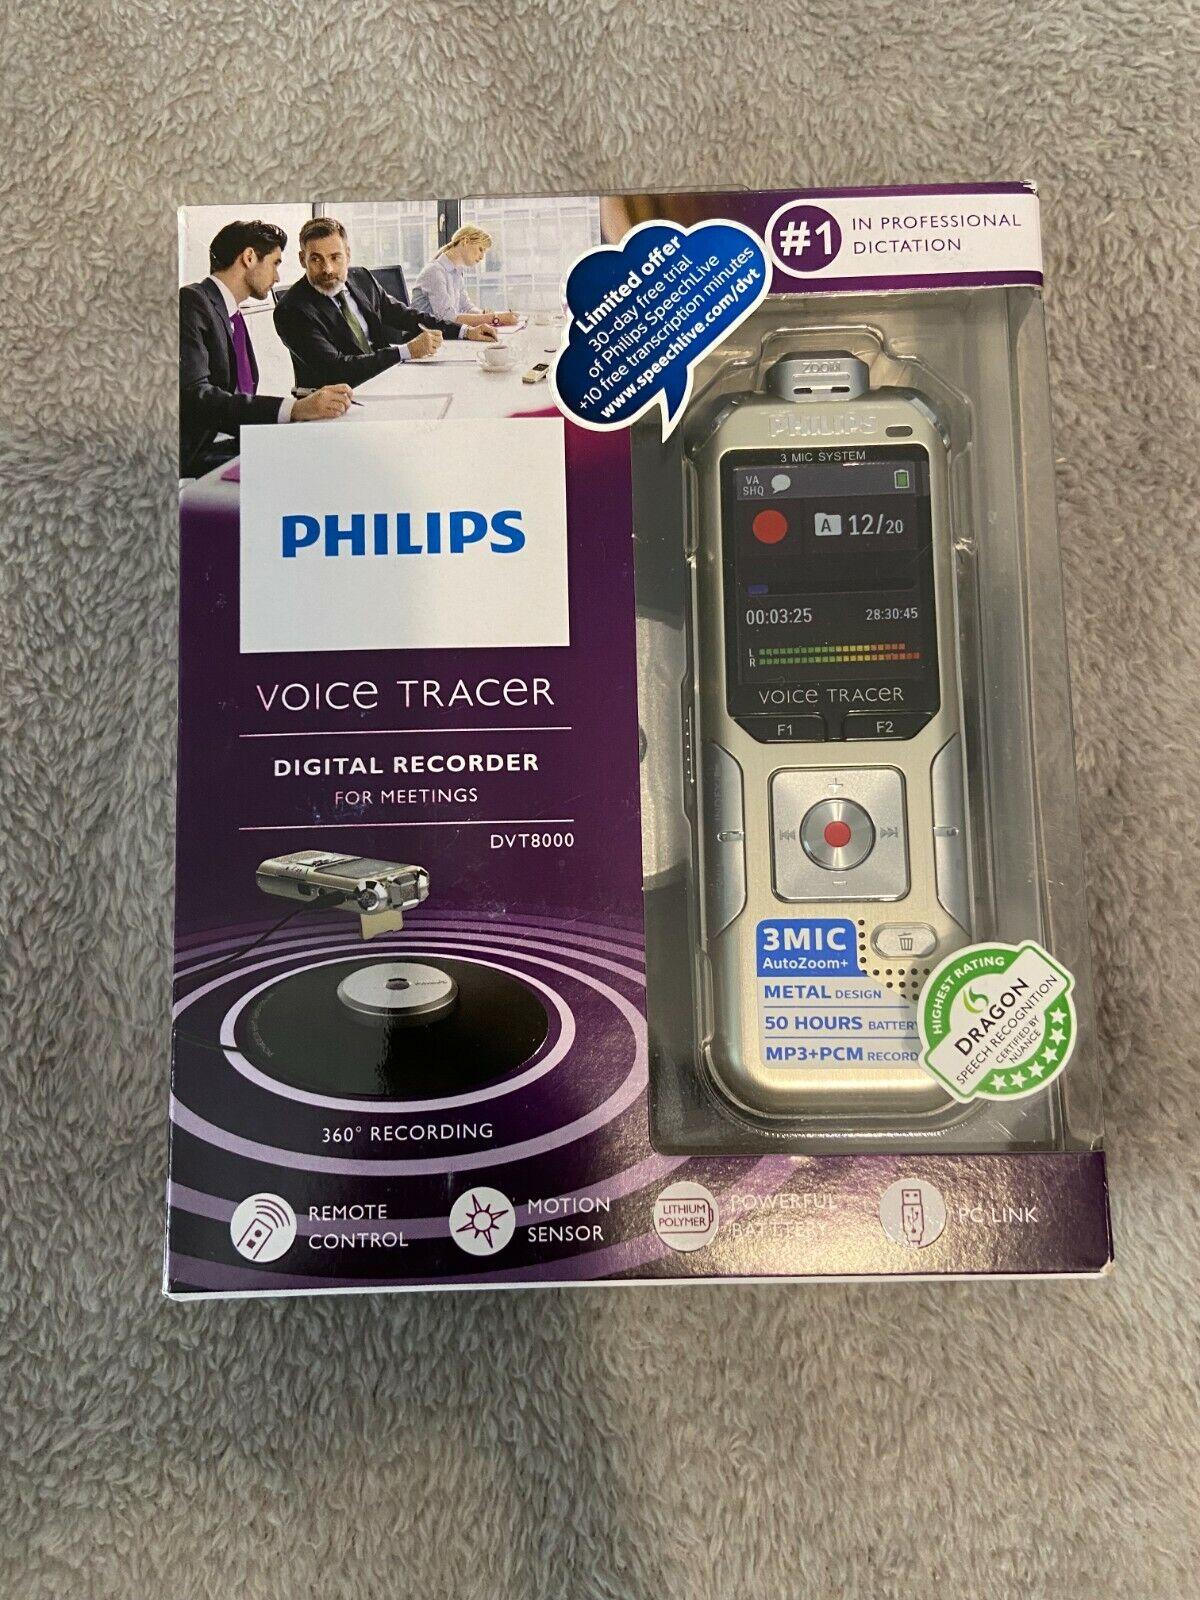 PHILIPS DVT8000 VOICE TRACER - 360 recording